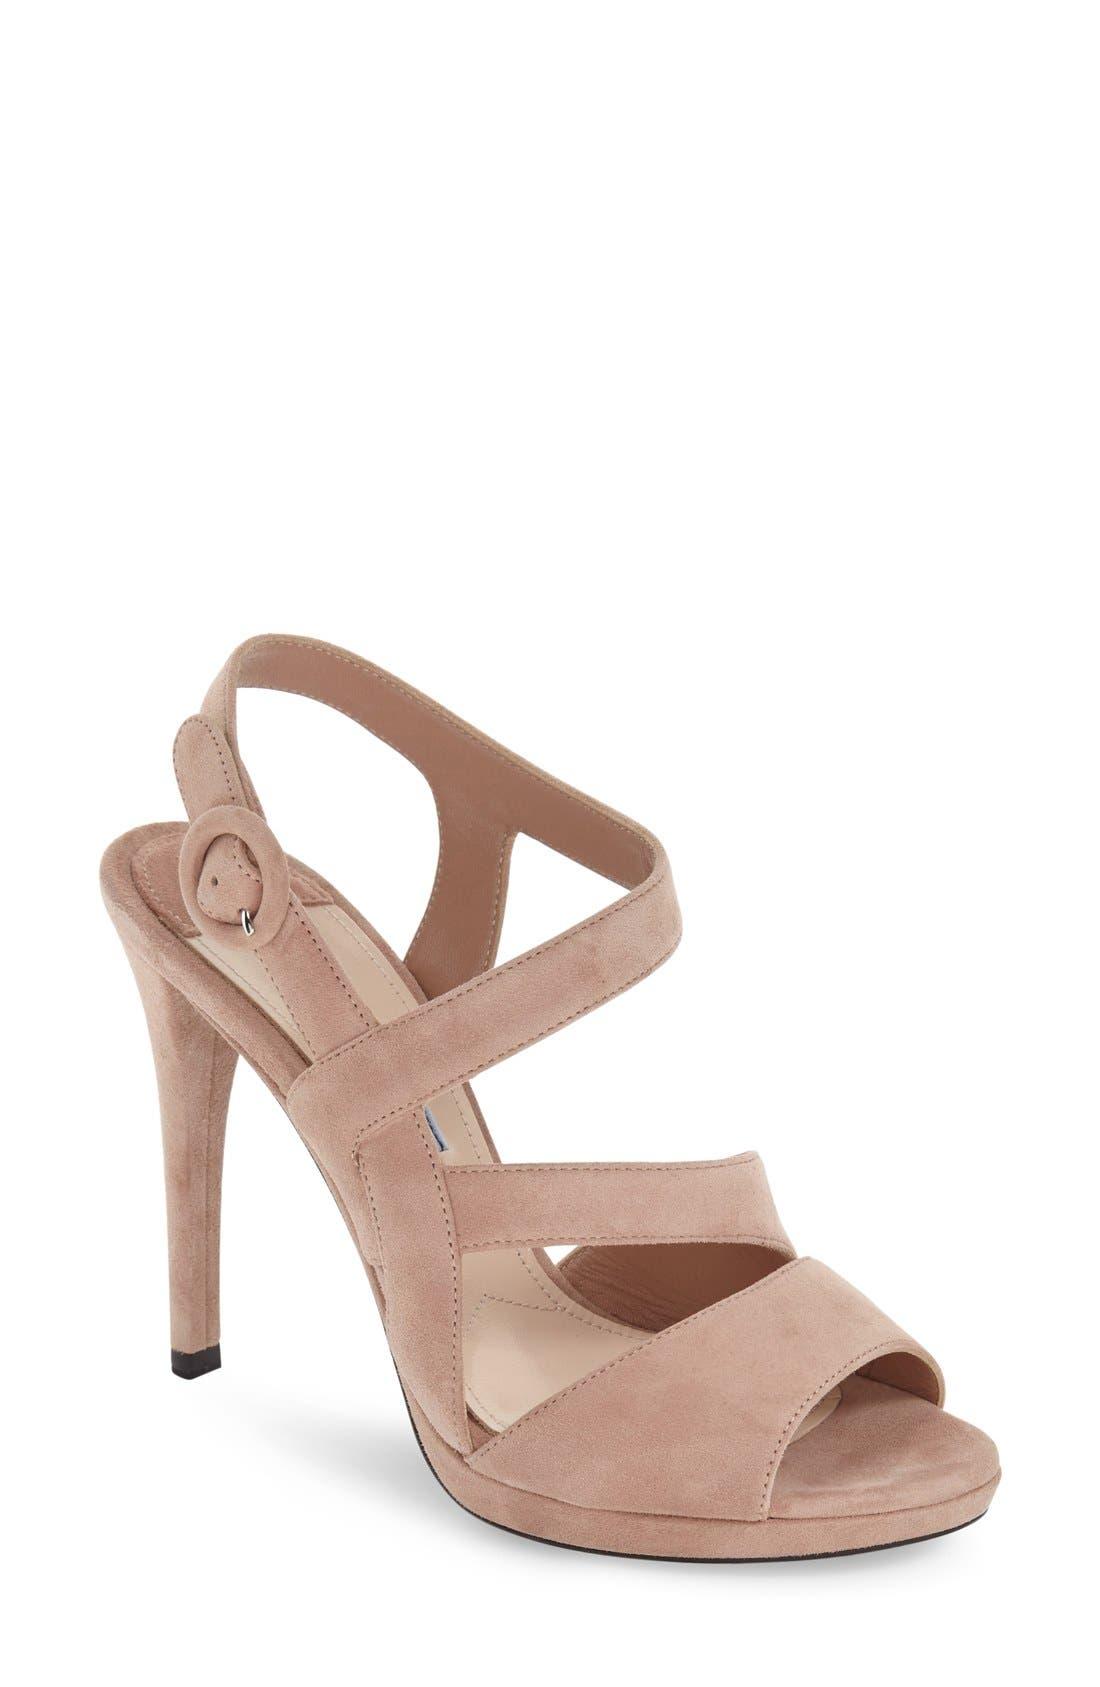 Alternate Image 1 Selected - Prada Strappy Sandal (Women)